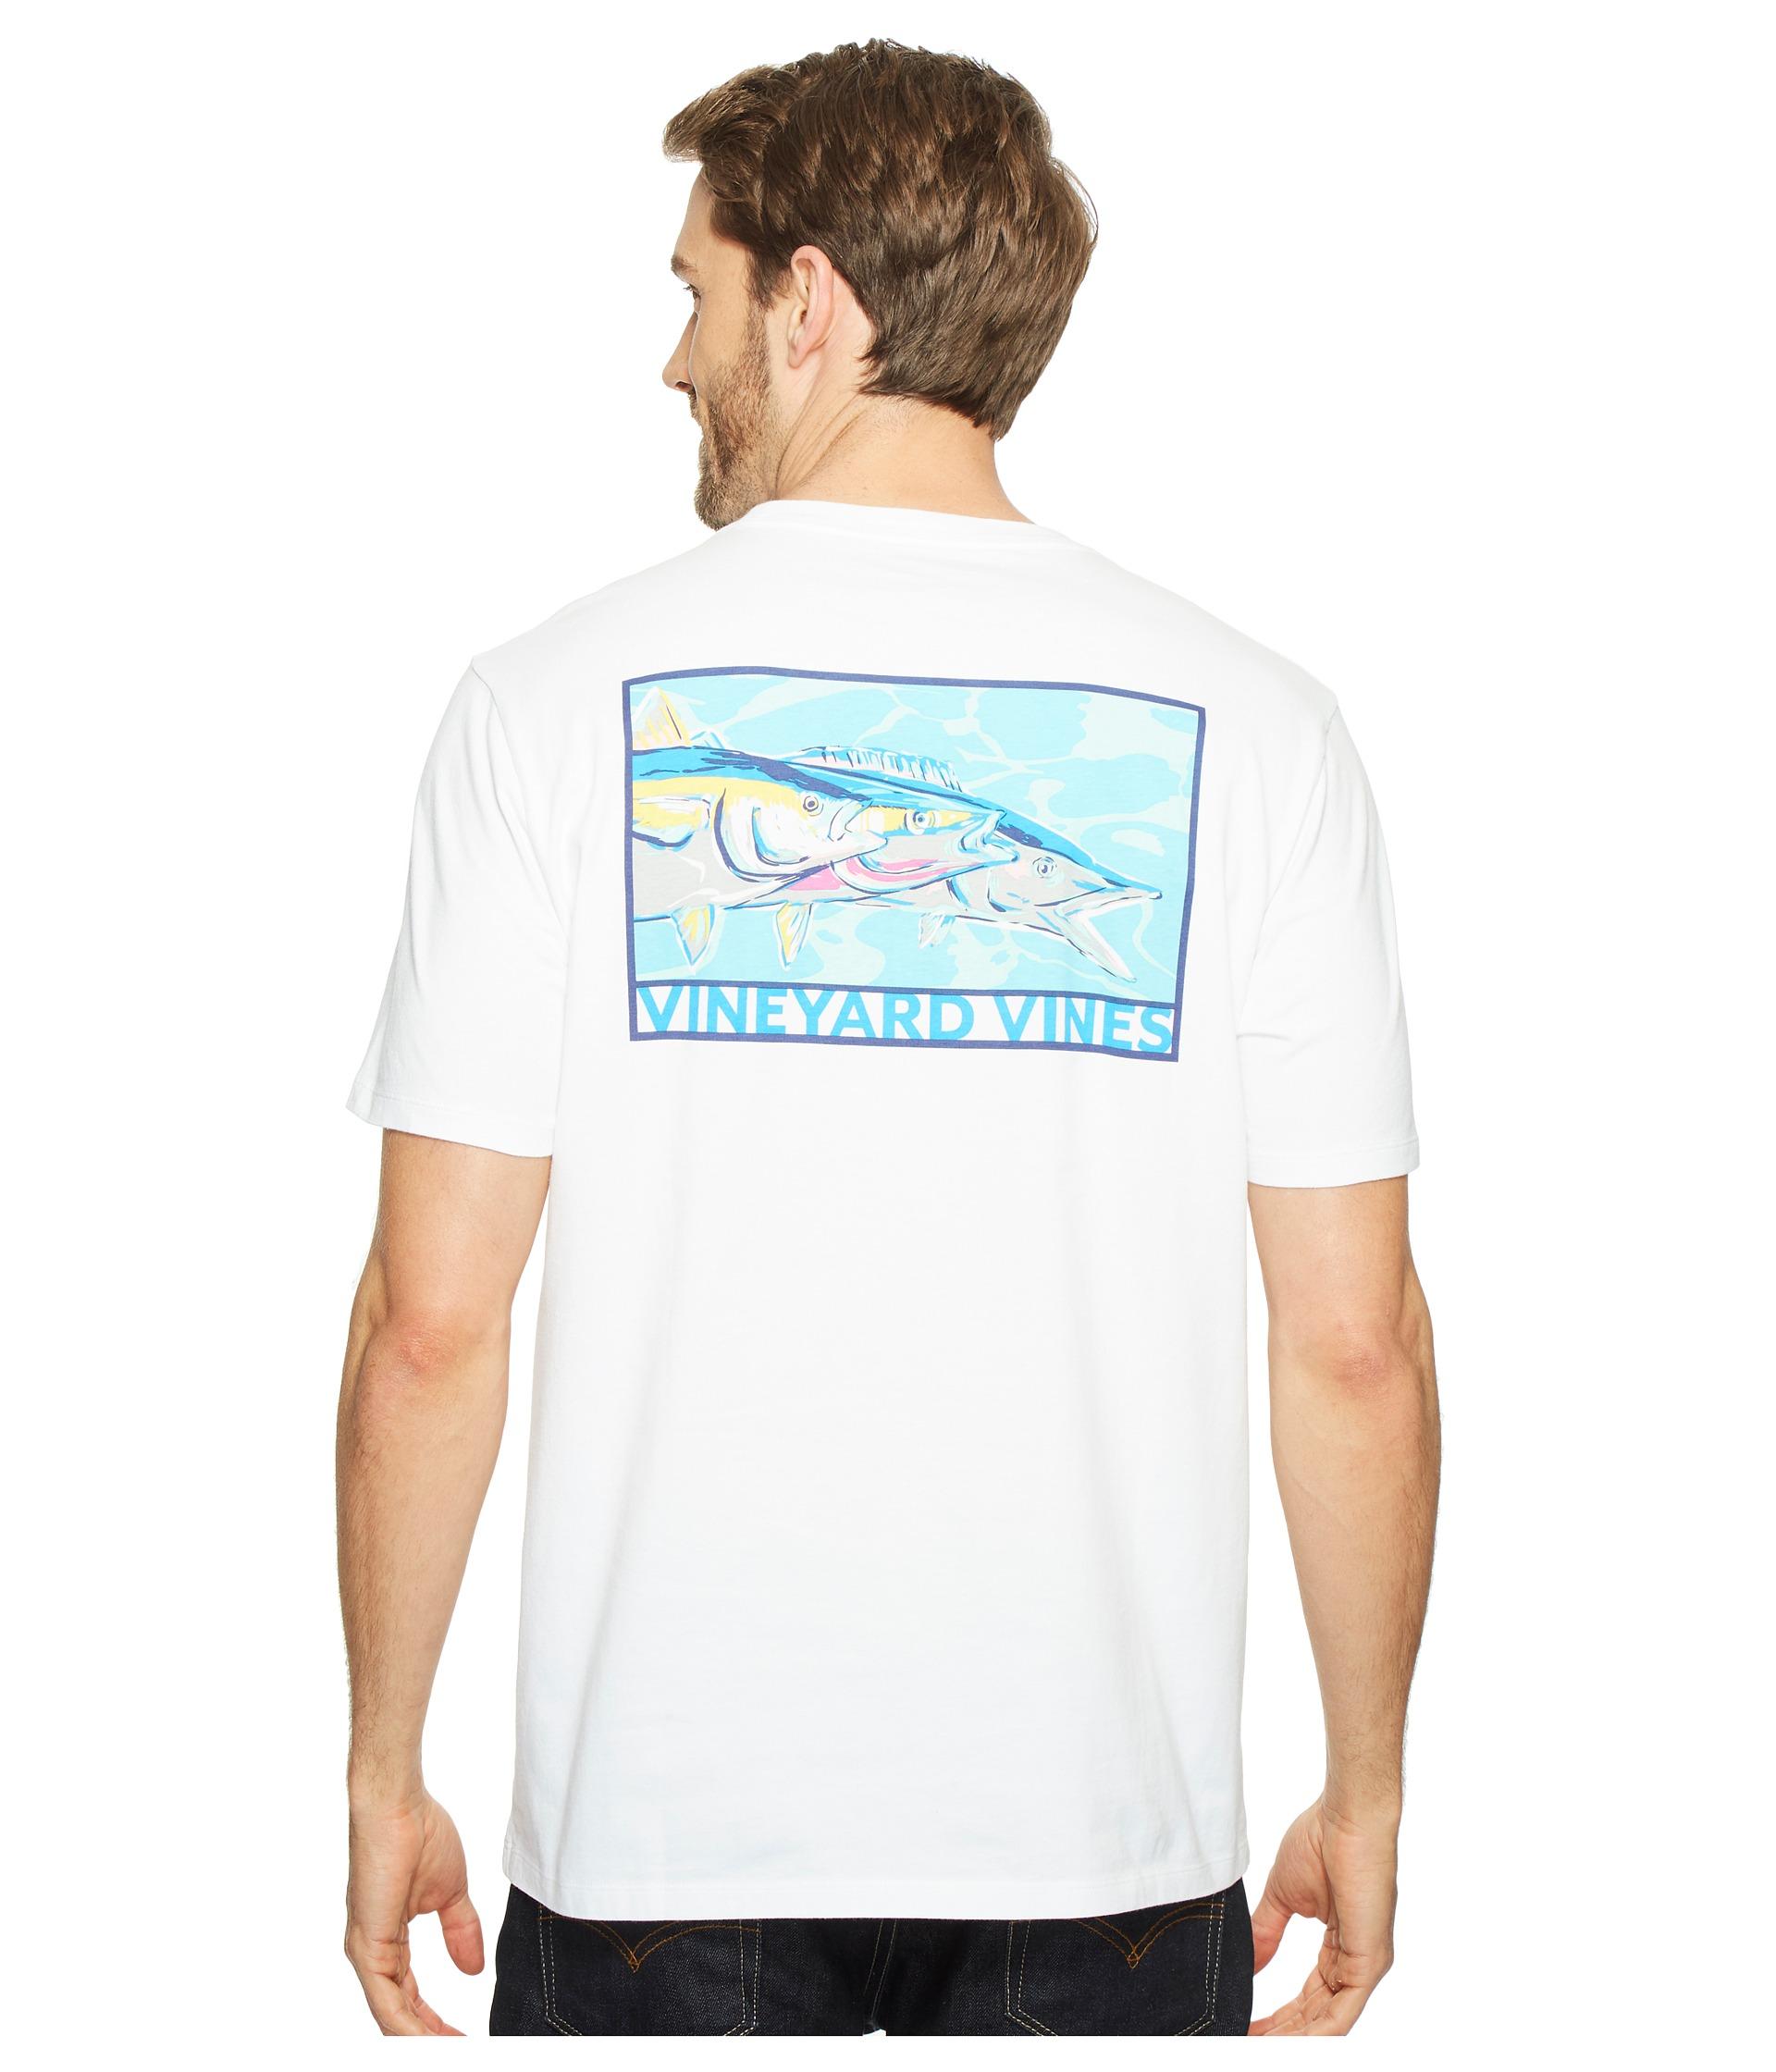 Vineyard vines short sleeve tri blend fish pocket t shirt for Vineyard vines fishing shirt